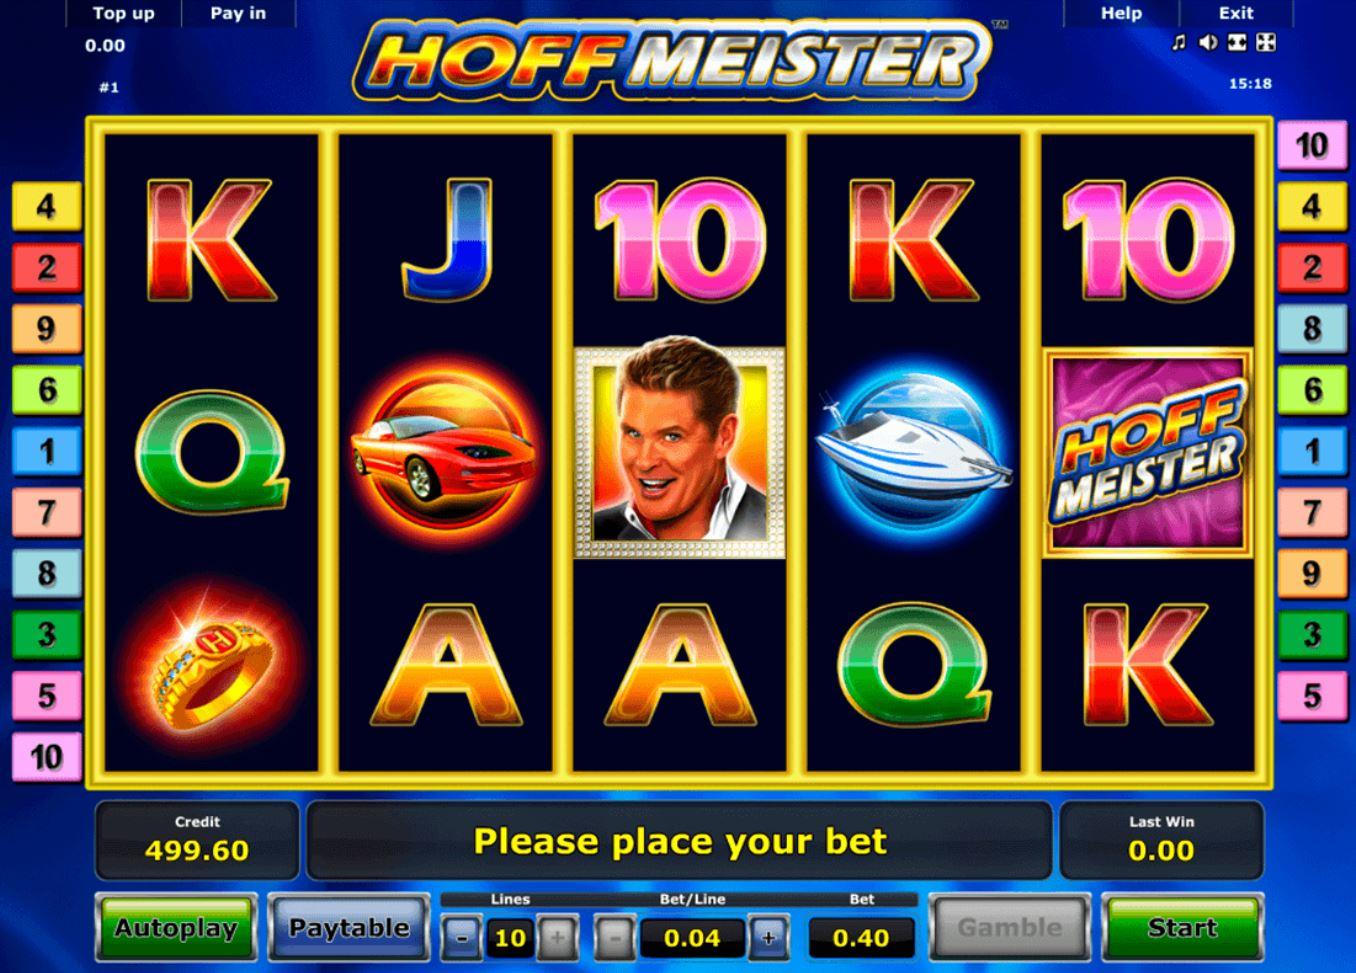 Automaten Spiele - 977755